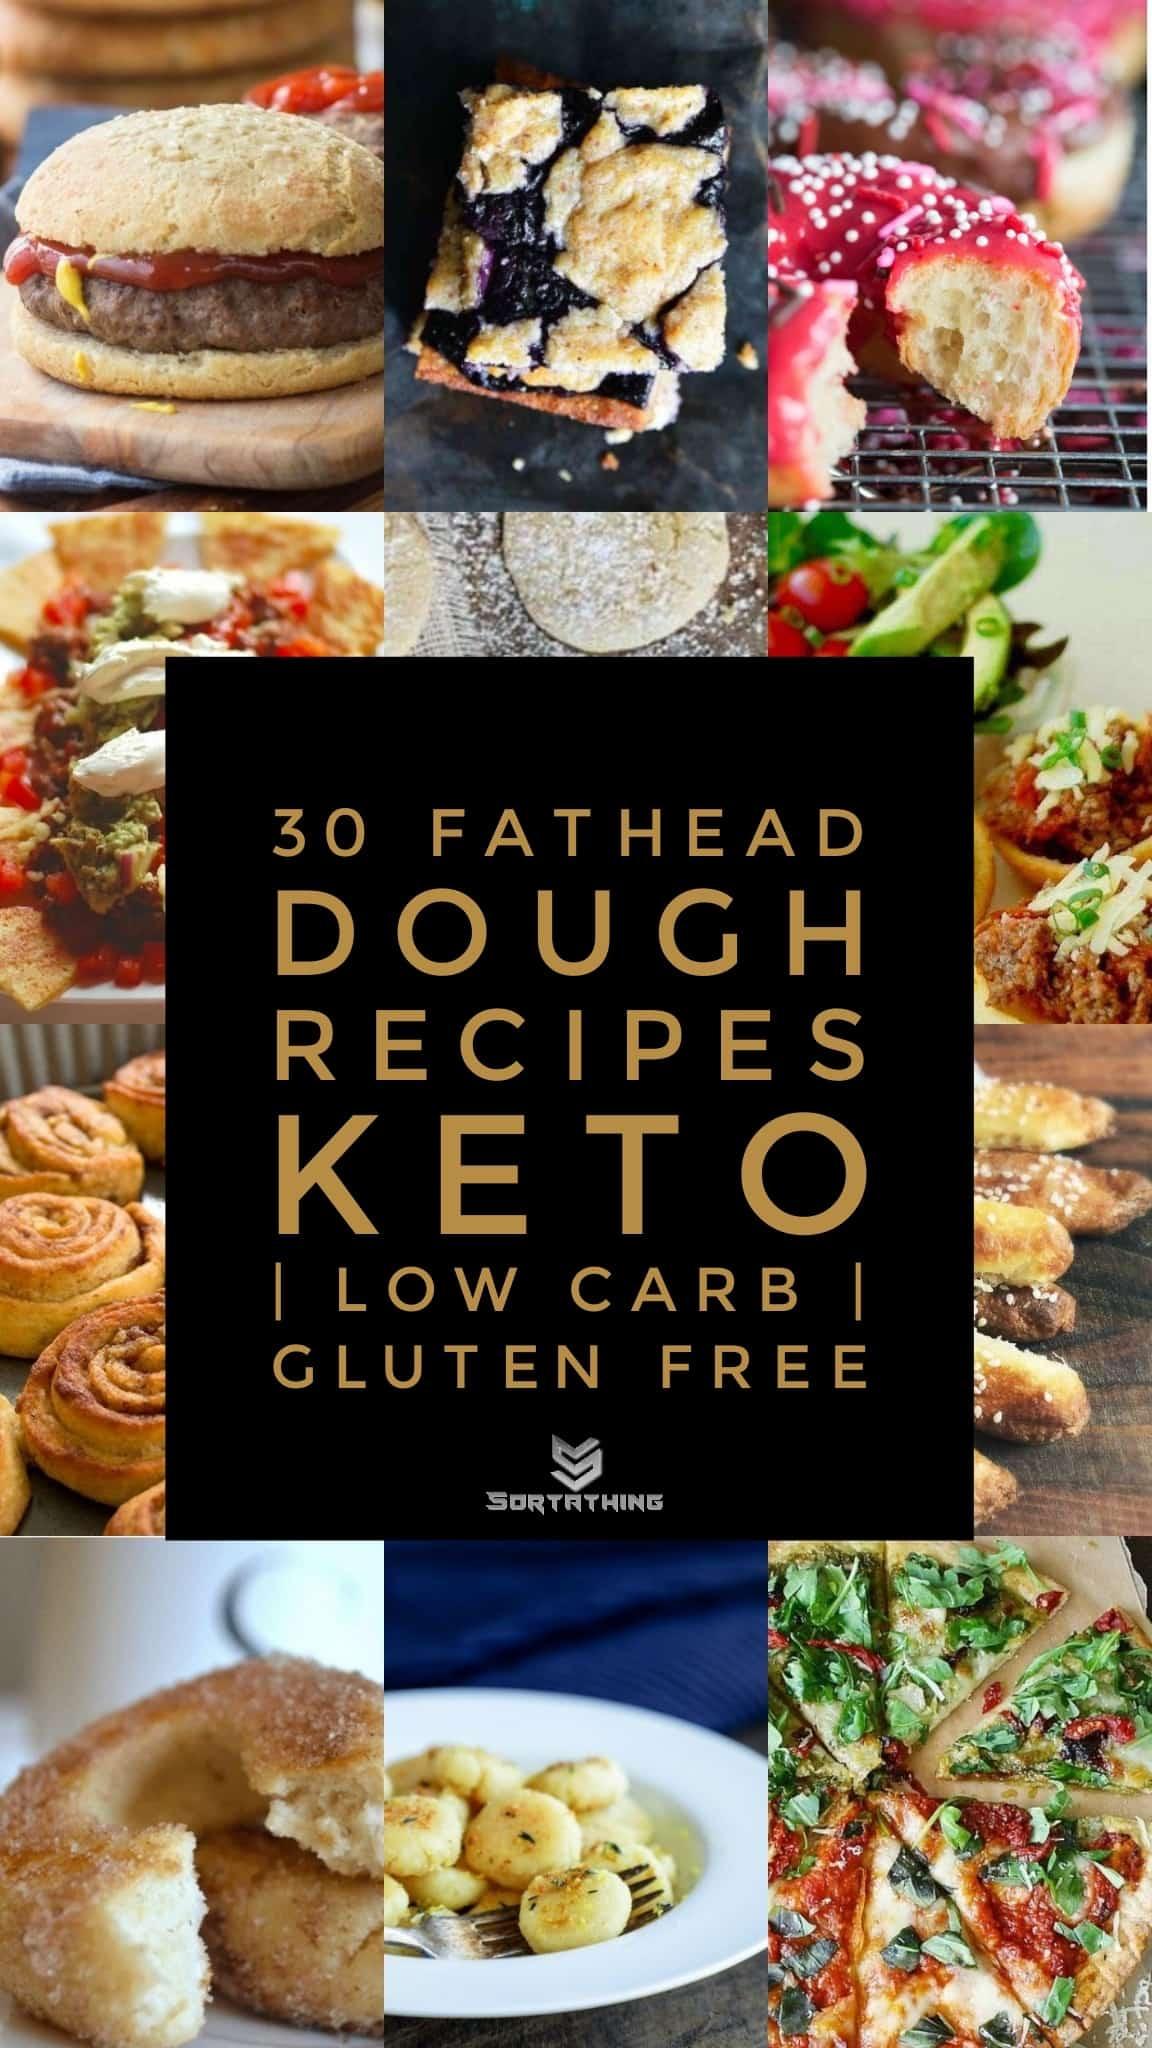 30 Fathead Dough Recipes - Keto